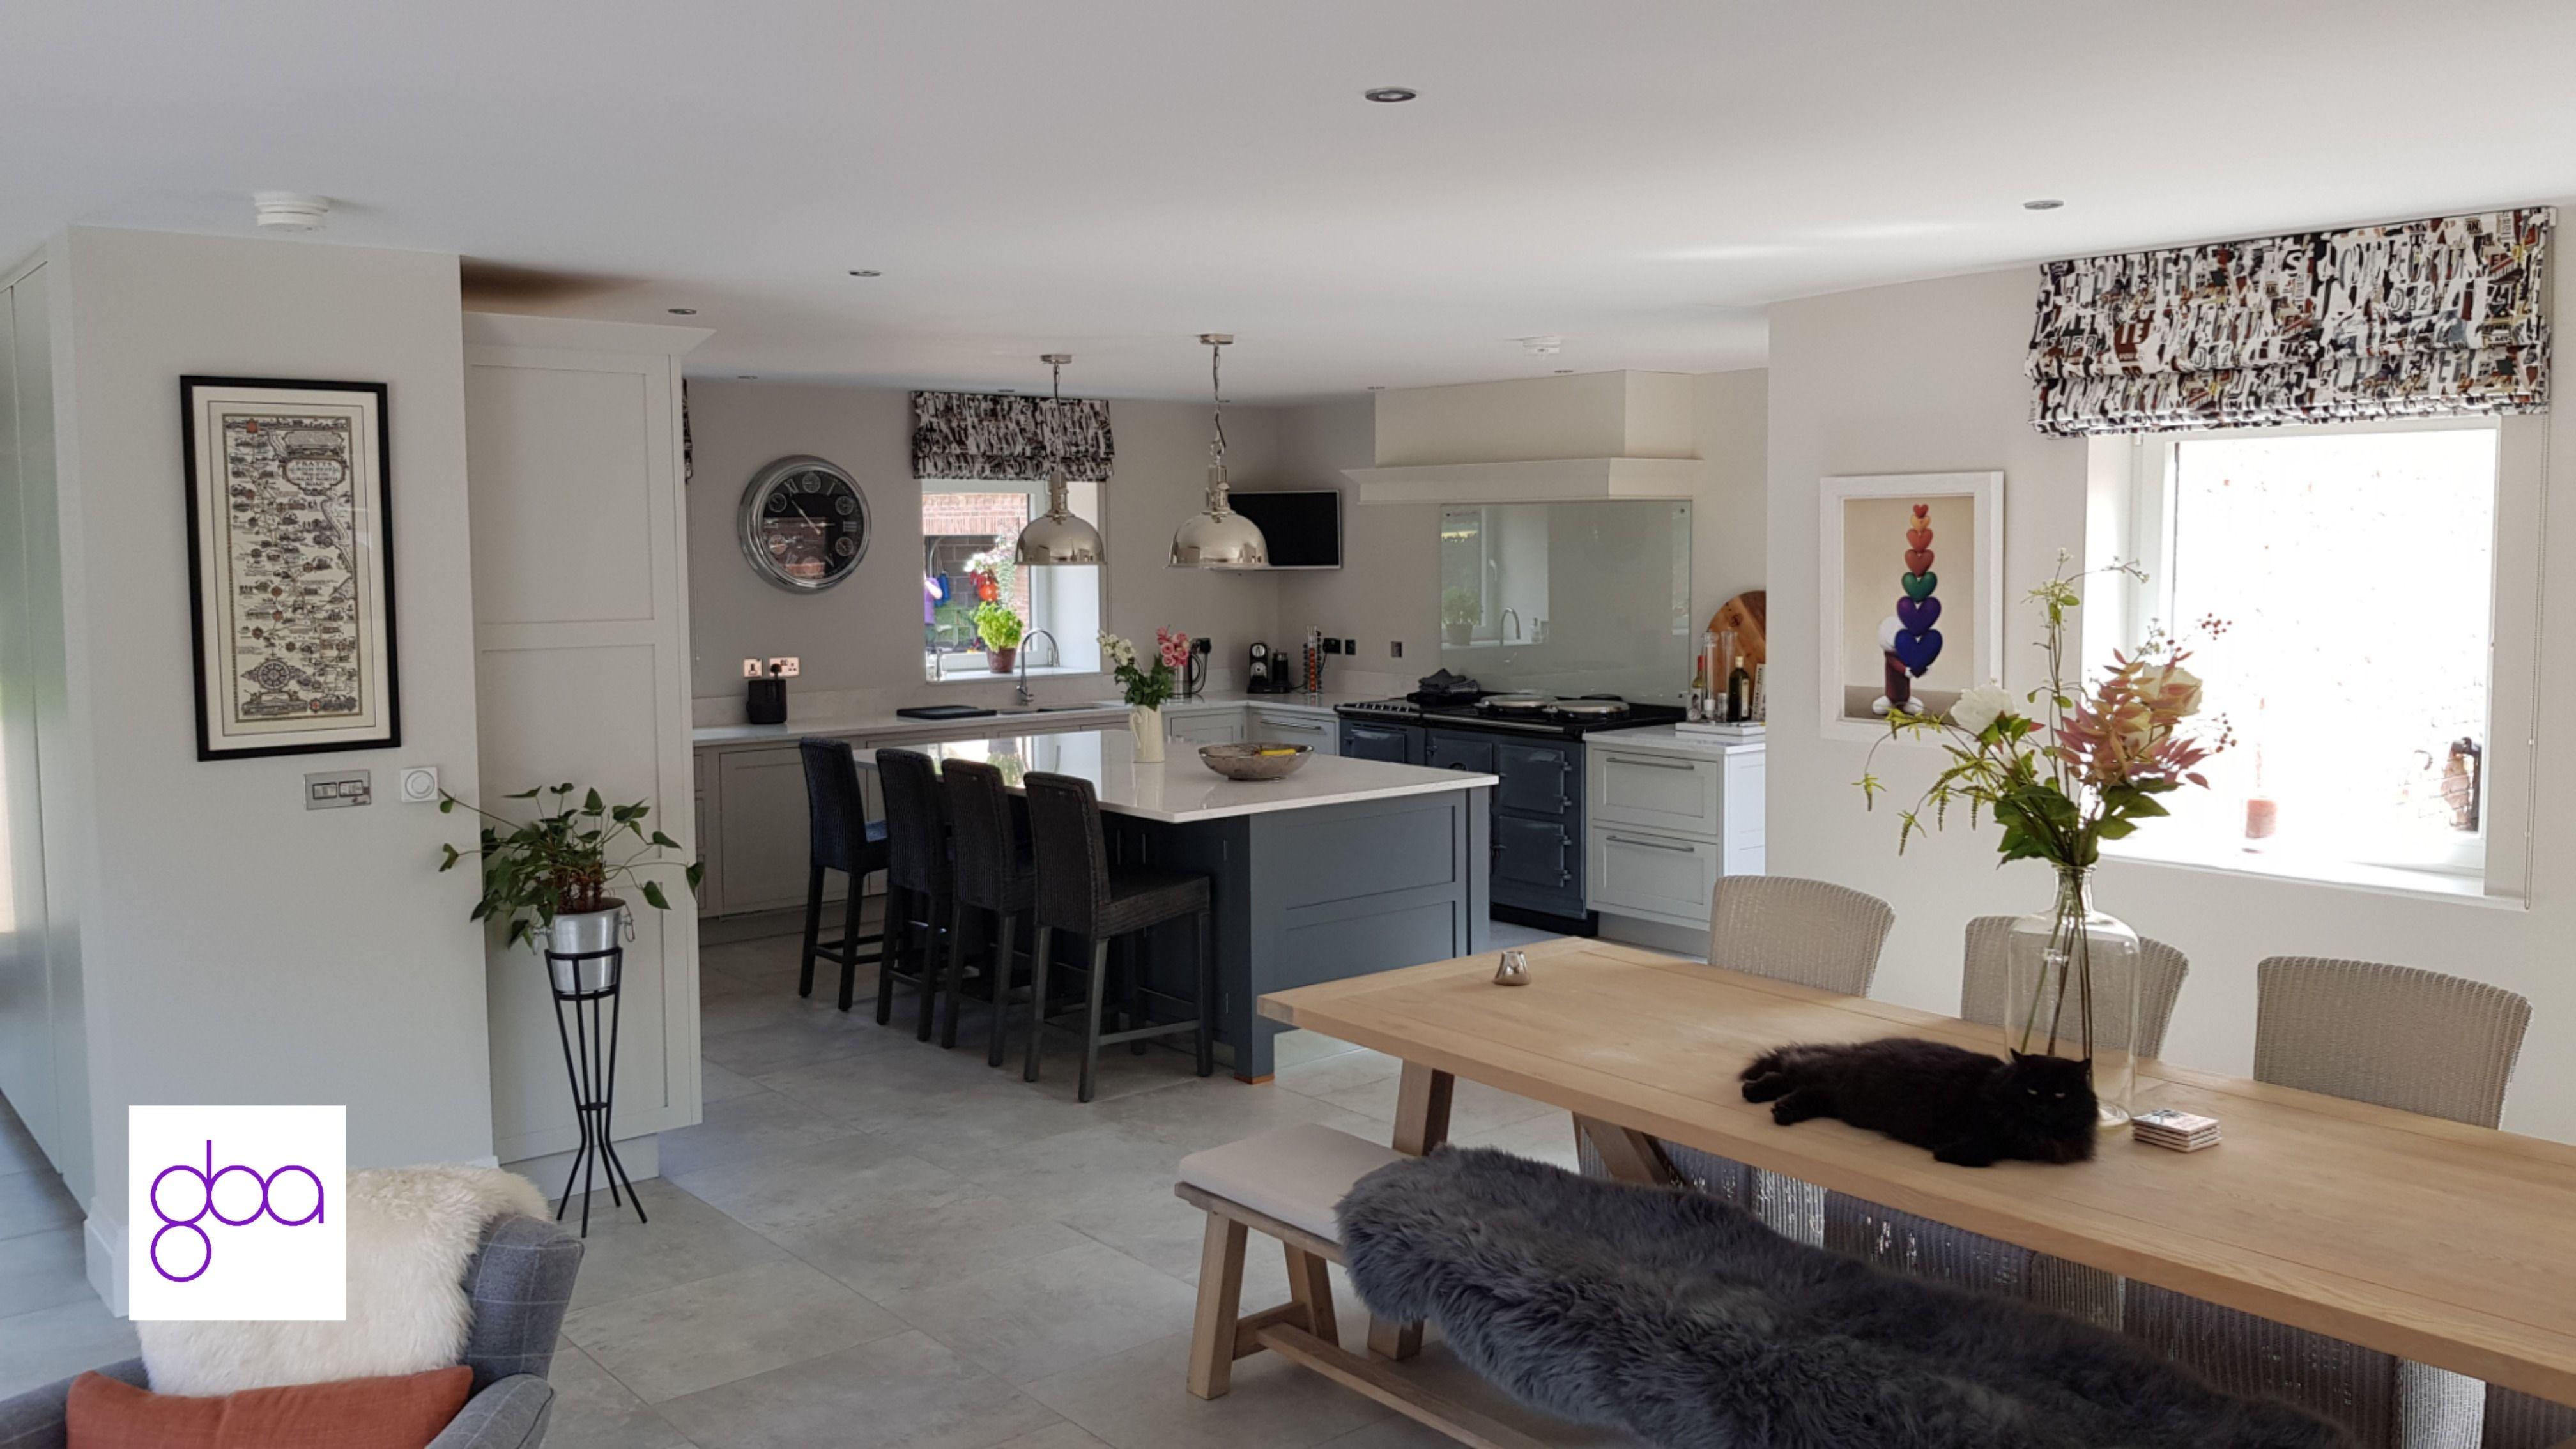 #interiors #design #architecture #finishes #decoration #kitchen #flooring #marble #modernarchitecture #dreamhouse #comingsoon #modernhouseinterior #modernhouseexterior #modernbarn #landscaping